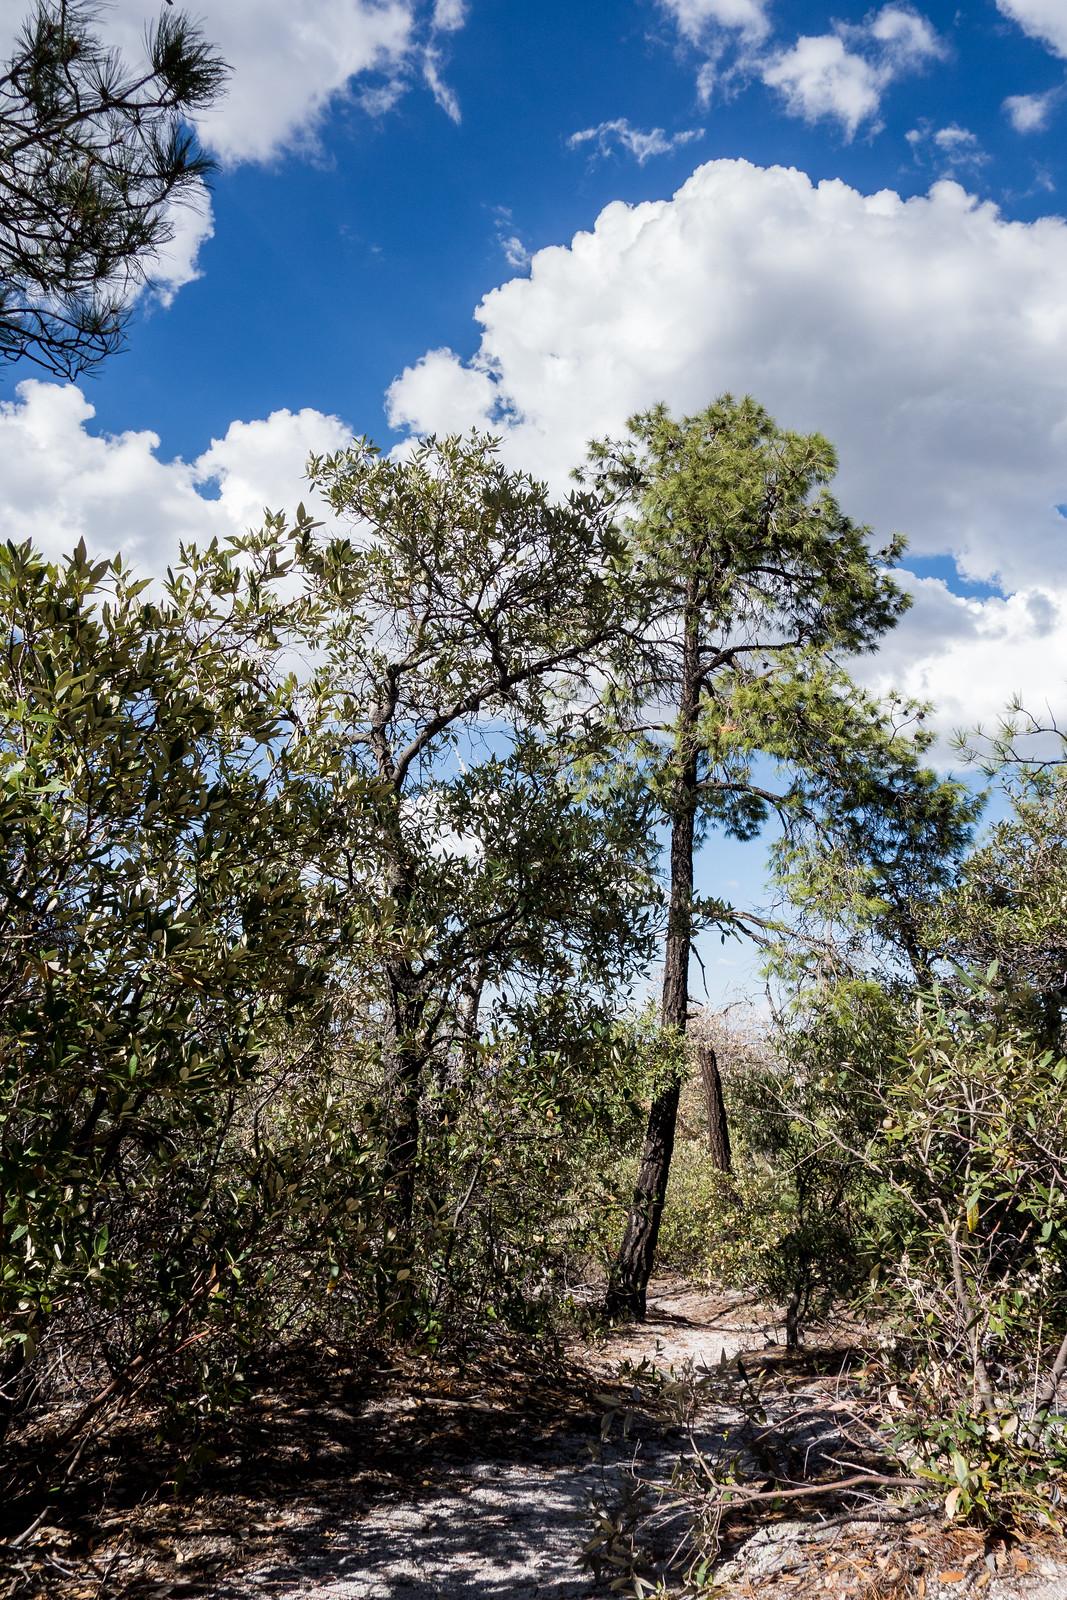 1407 Brush Corral Trail near the Brush Corral Shortcut Trail